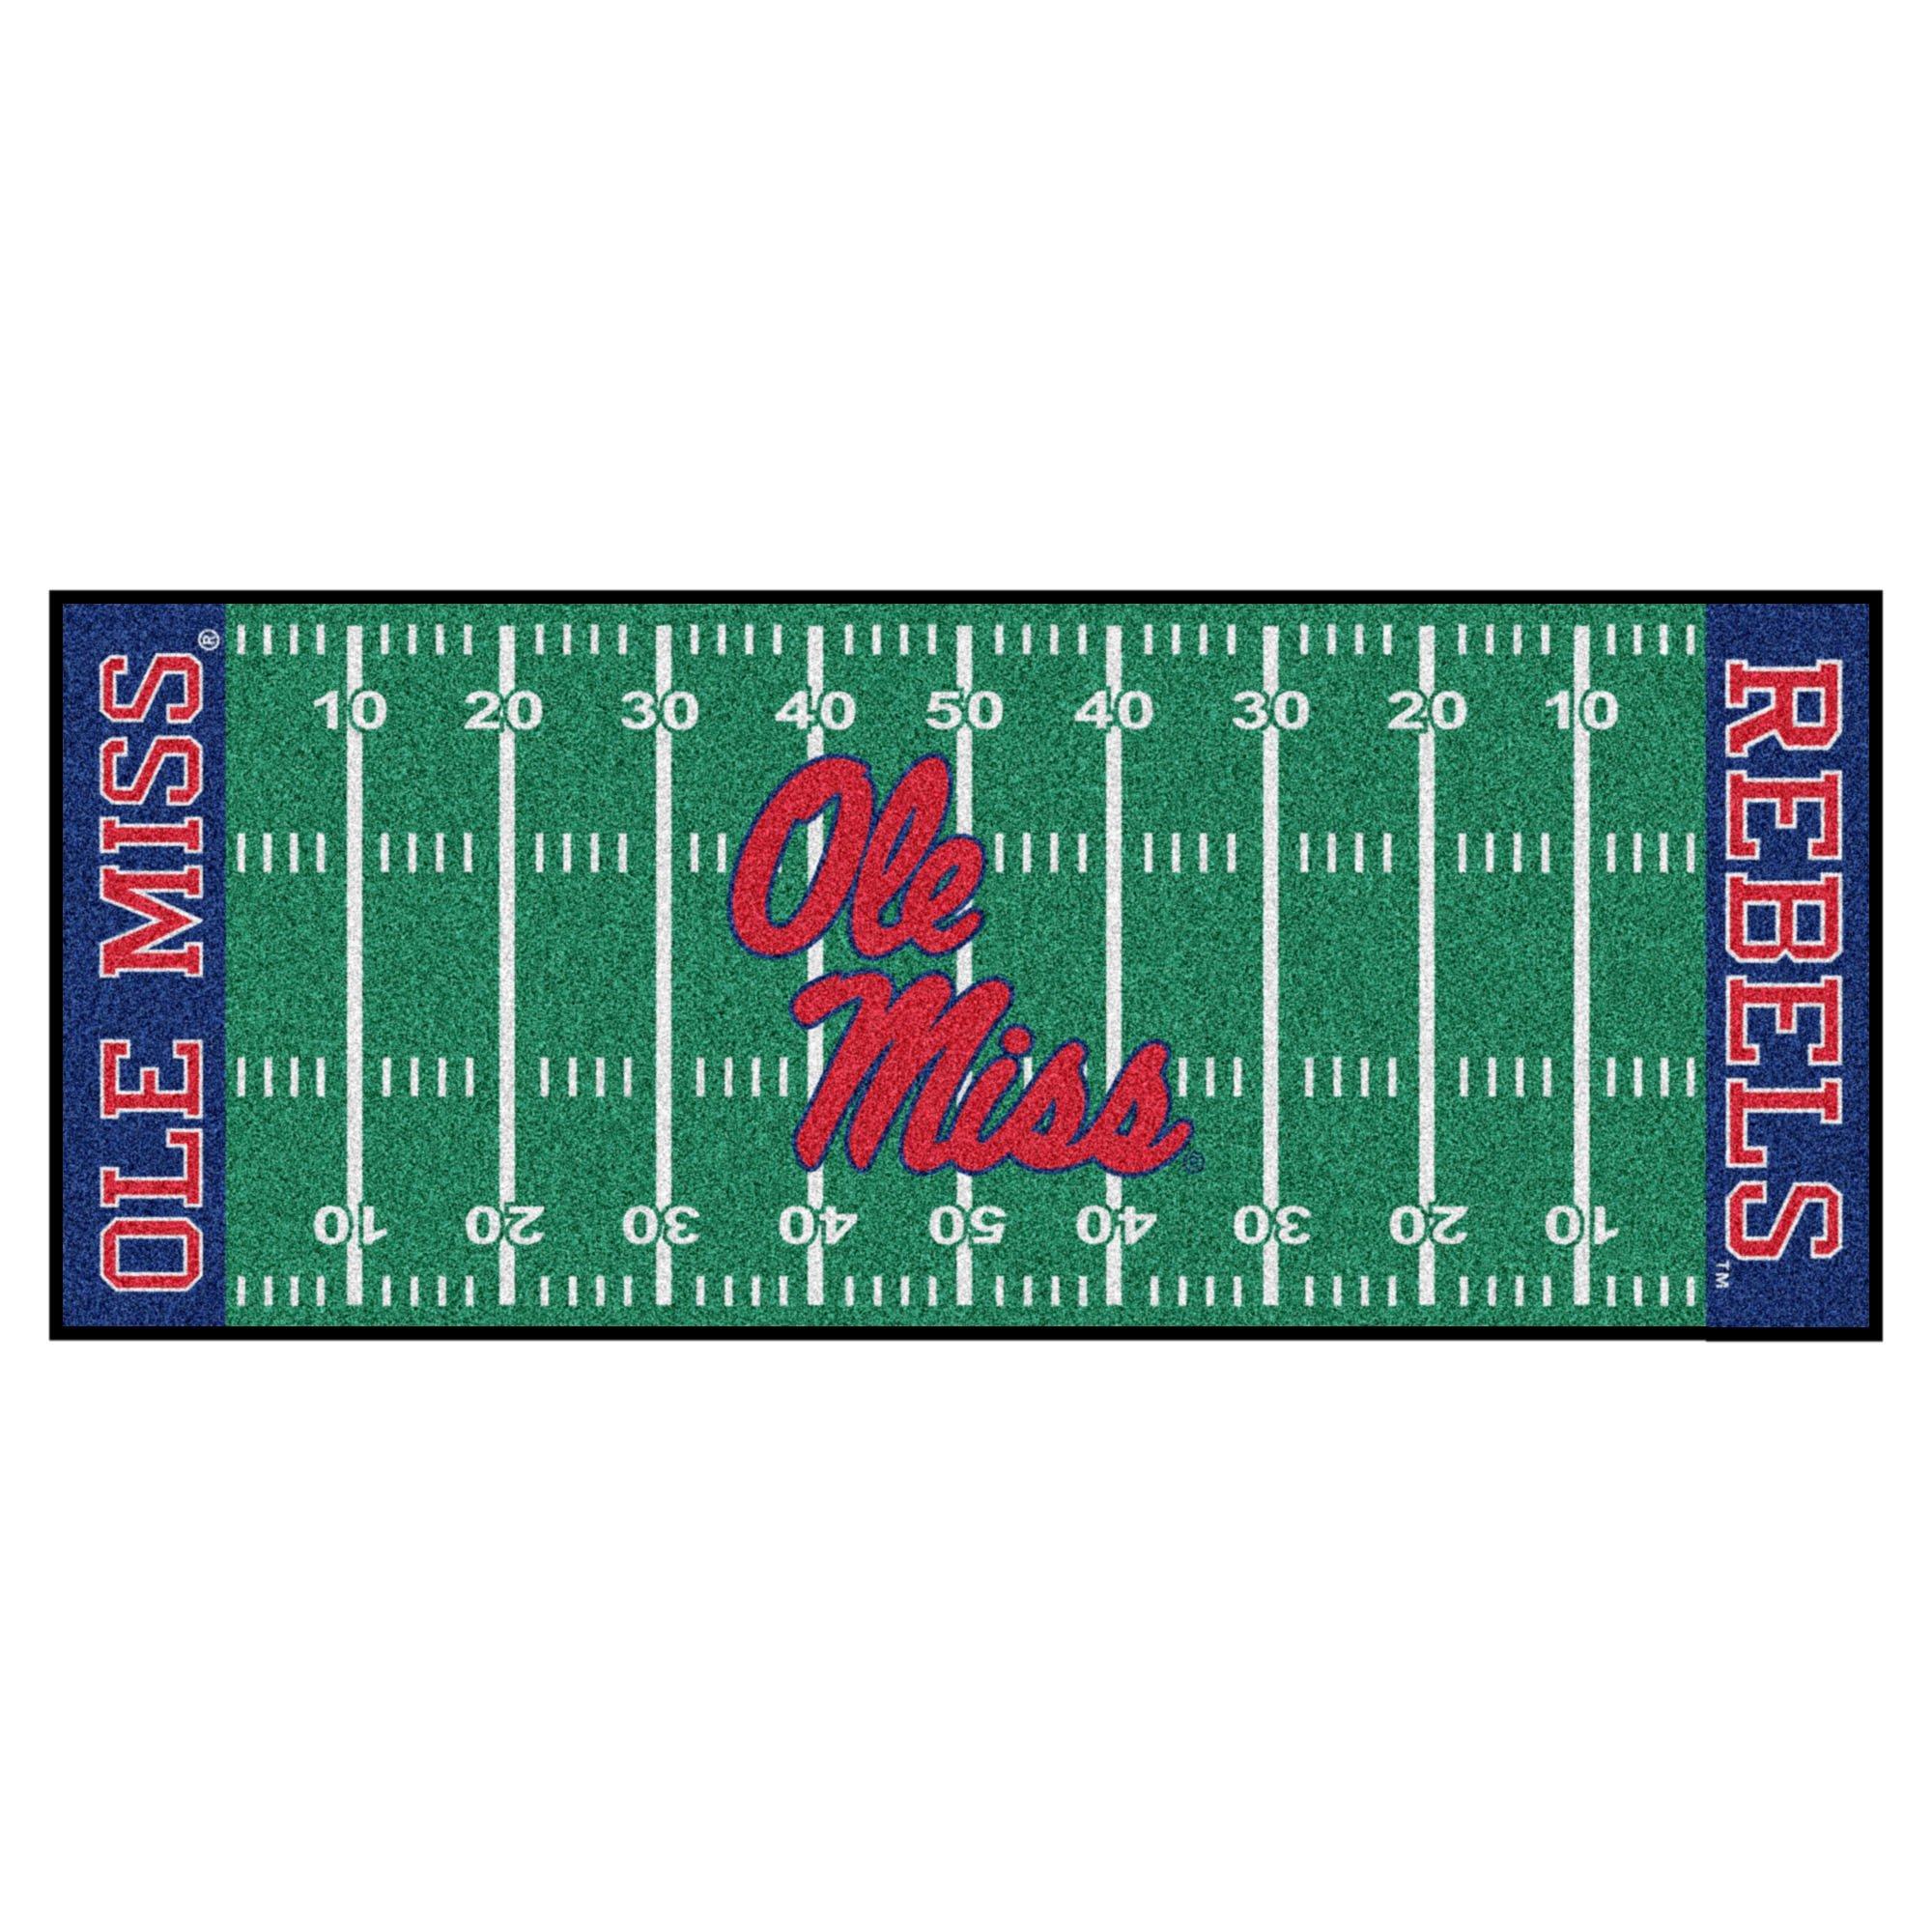 NCAA University of Mississippi (Ole Miss) Rebels Football Field Runner Mat Area Rug